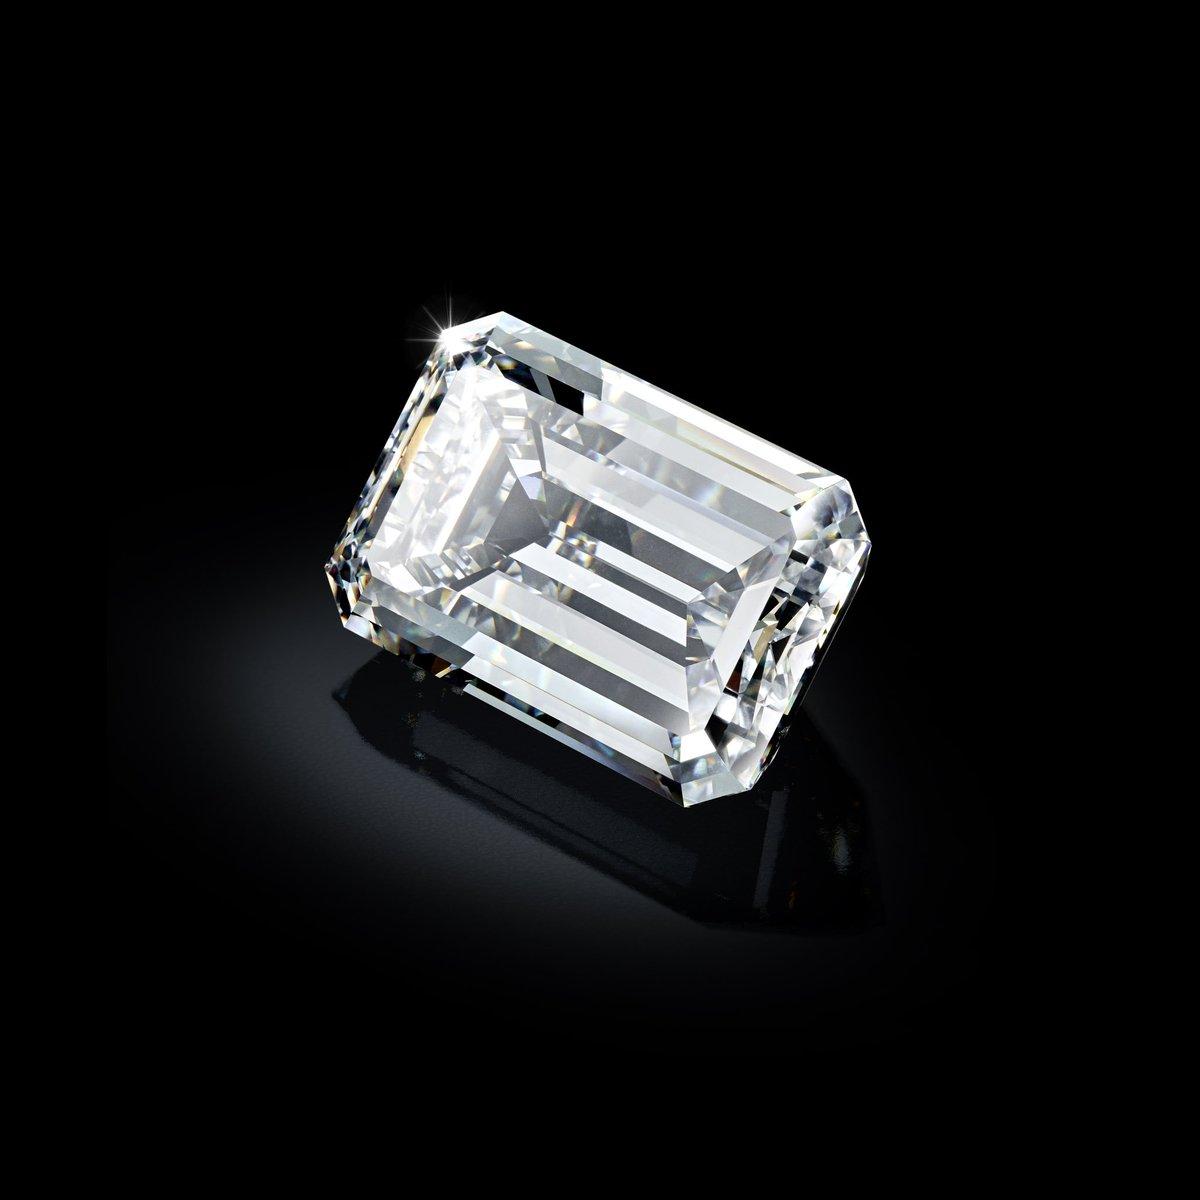 Whatever the angle, this extraordinary gem shines in literally dazzling glory.  #deGRISOGONO #TheArtofdeGRISOGONO  #Diamonds #Christies<br>http://pic.twitter.com/QJ70EVl80w